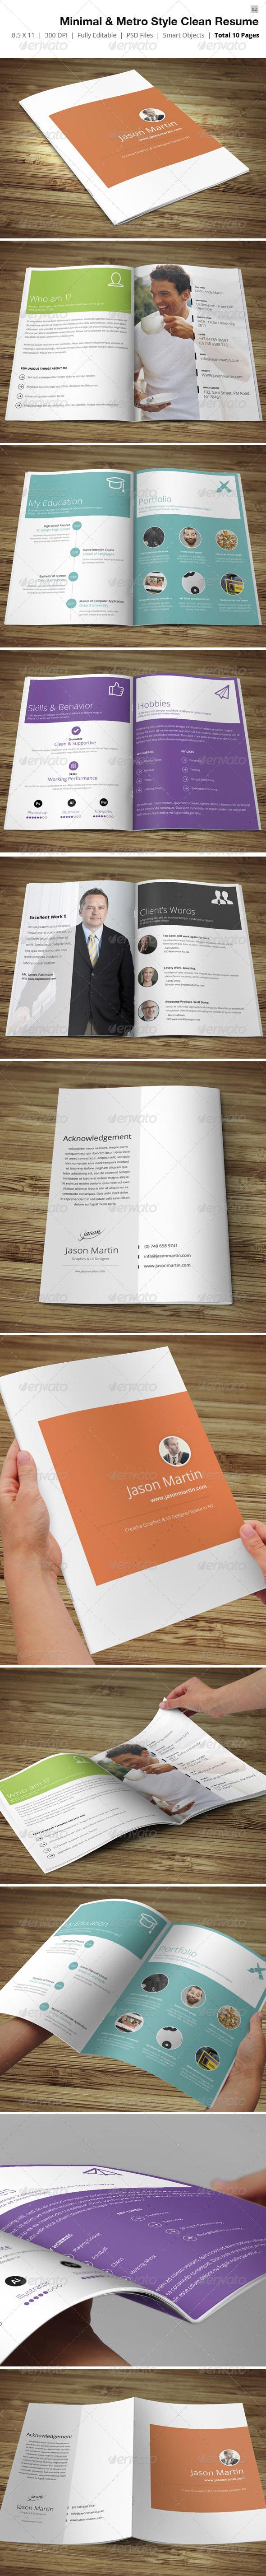 Minimal & Metro Style Resume  - Resumes Stationery